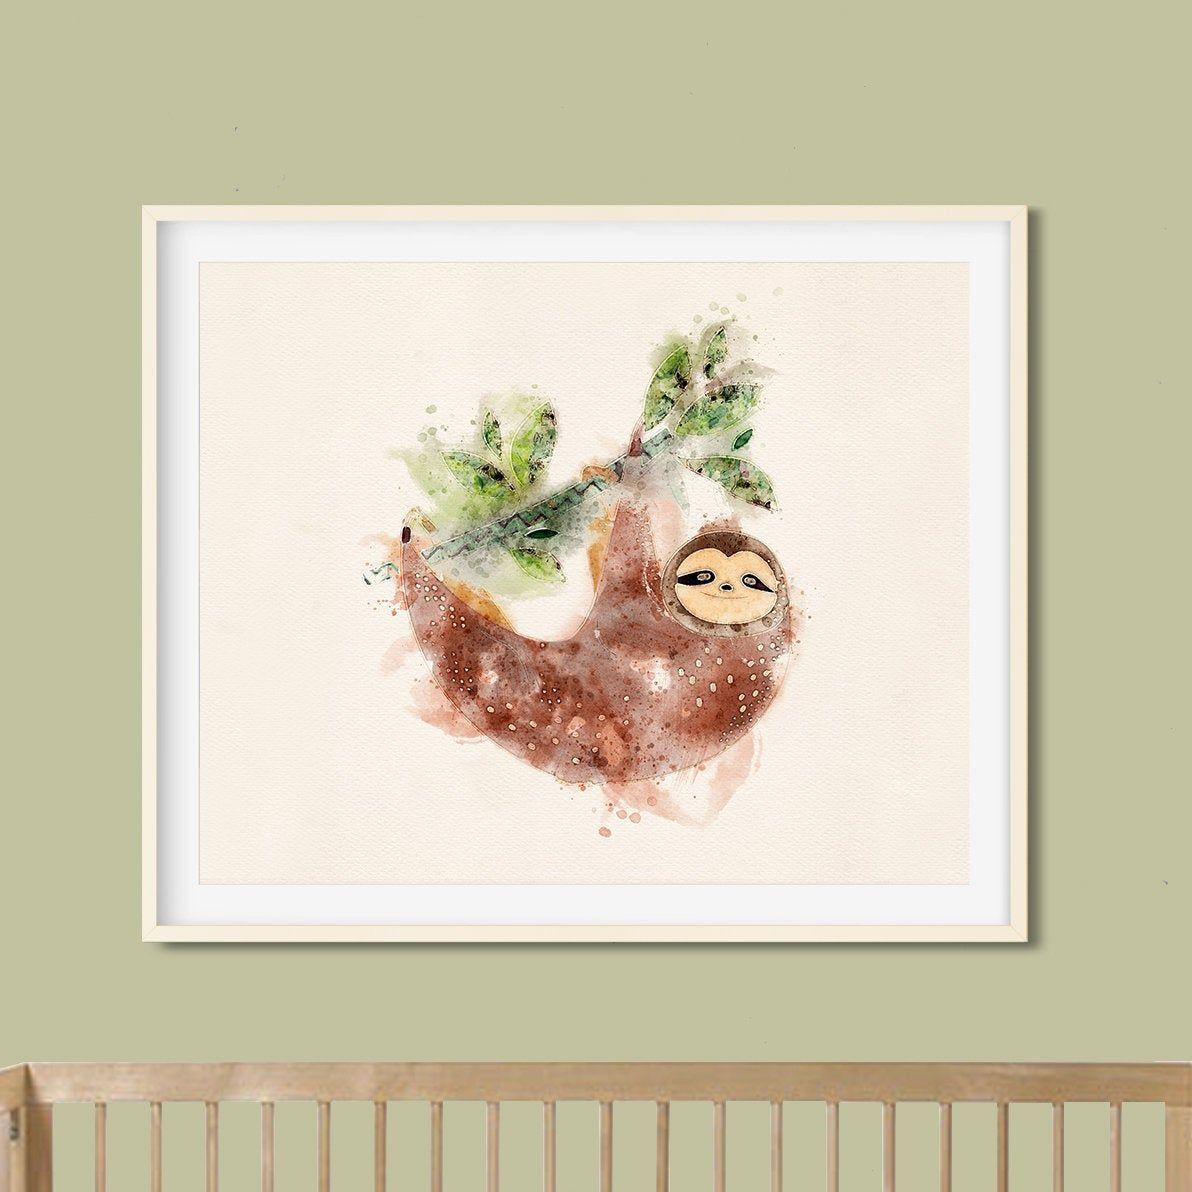 Watercolor Nursery Sloth Art Print Gender Neutral Baby Nursery Wall Decor Jungle Baby Animal Wall Art Baby Boy Nursery Sloth Print In 2020 Nursery Canvas Art Nursery Wall Decor